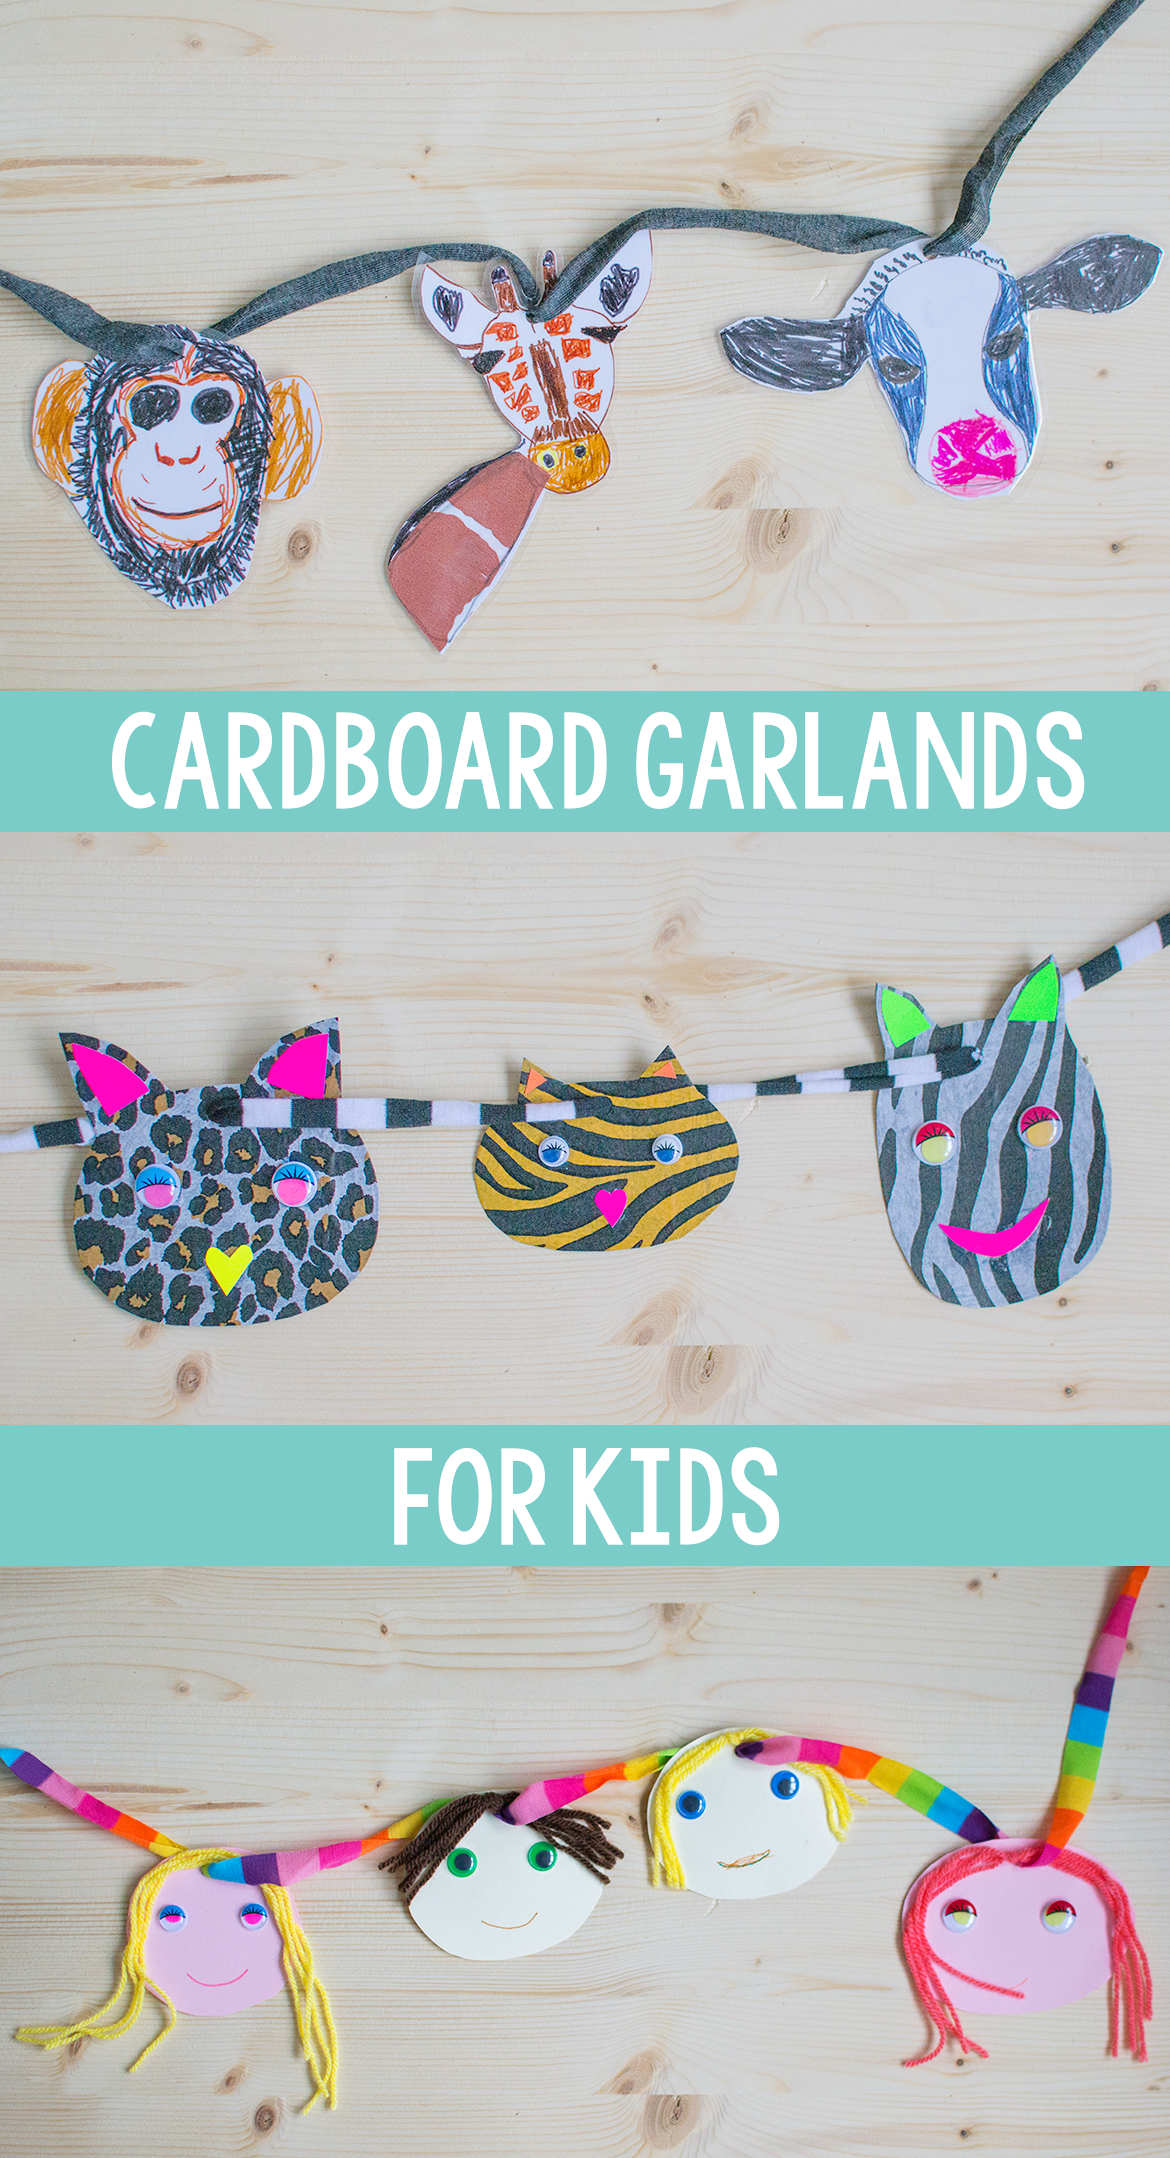 3 Ways To Make Cardboard Garlands For Kids | Garlands, Crafts and ...